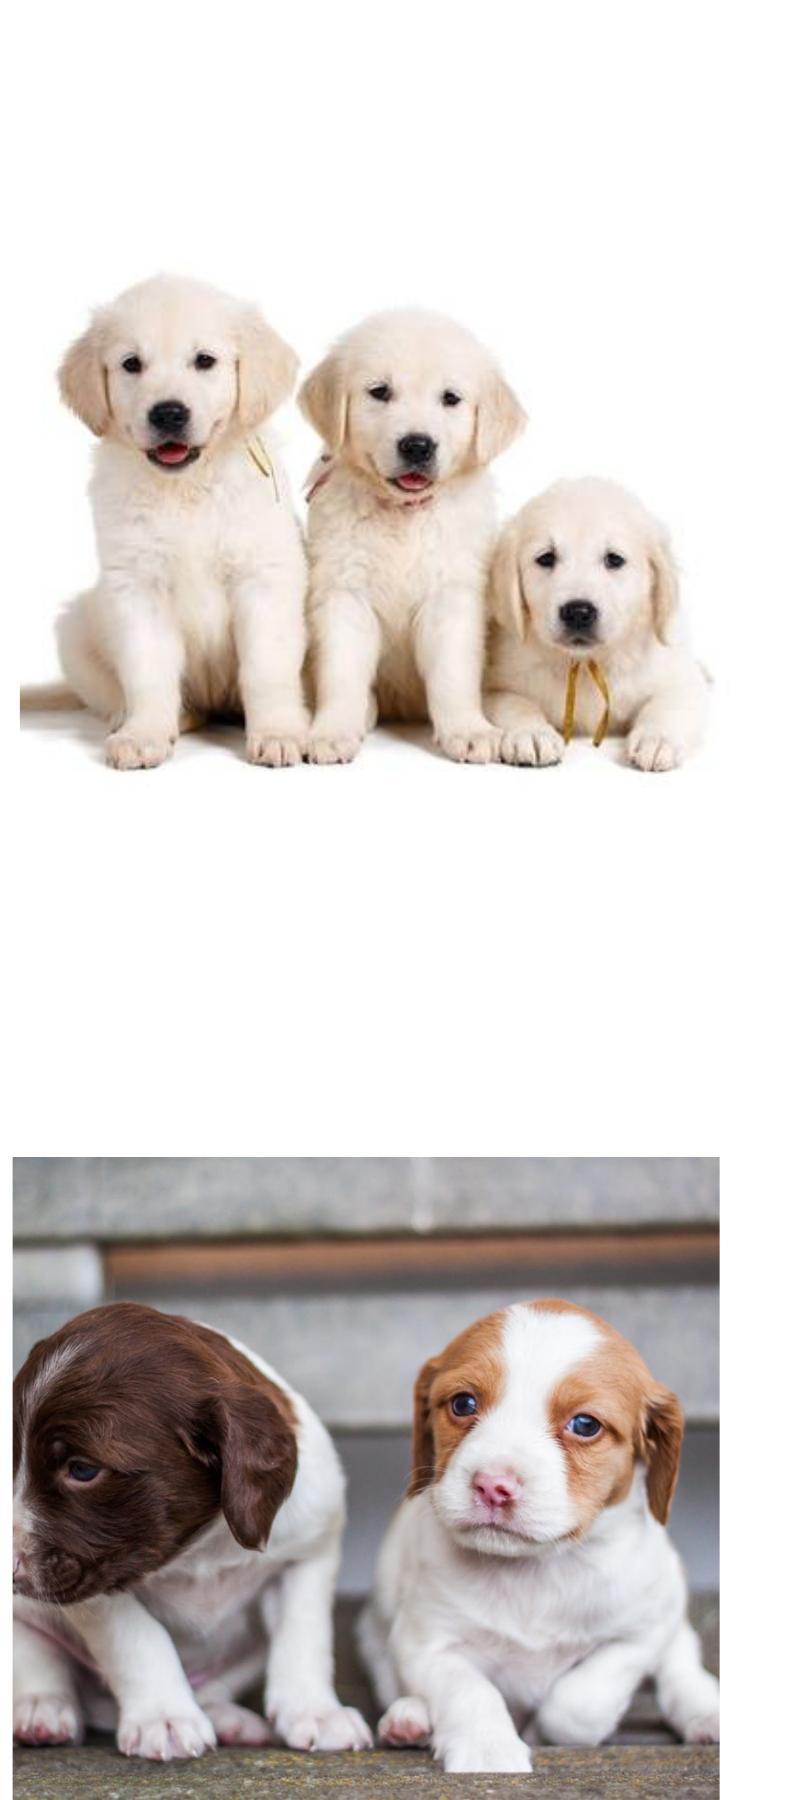 Free dog training videos. Dog training videos, Free dogs